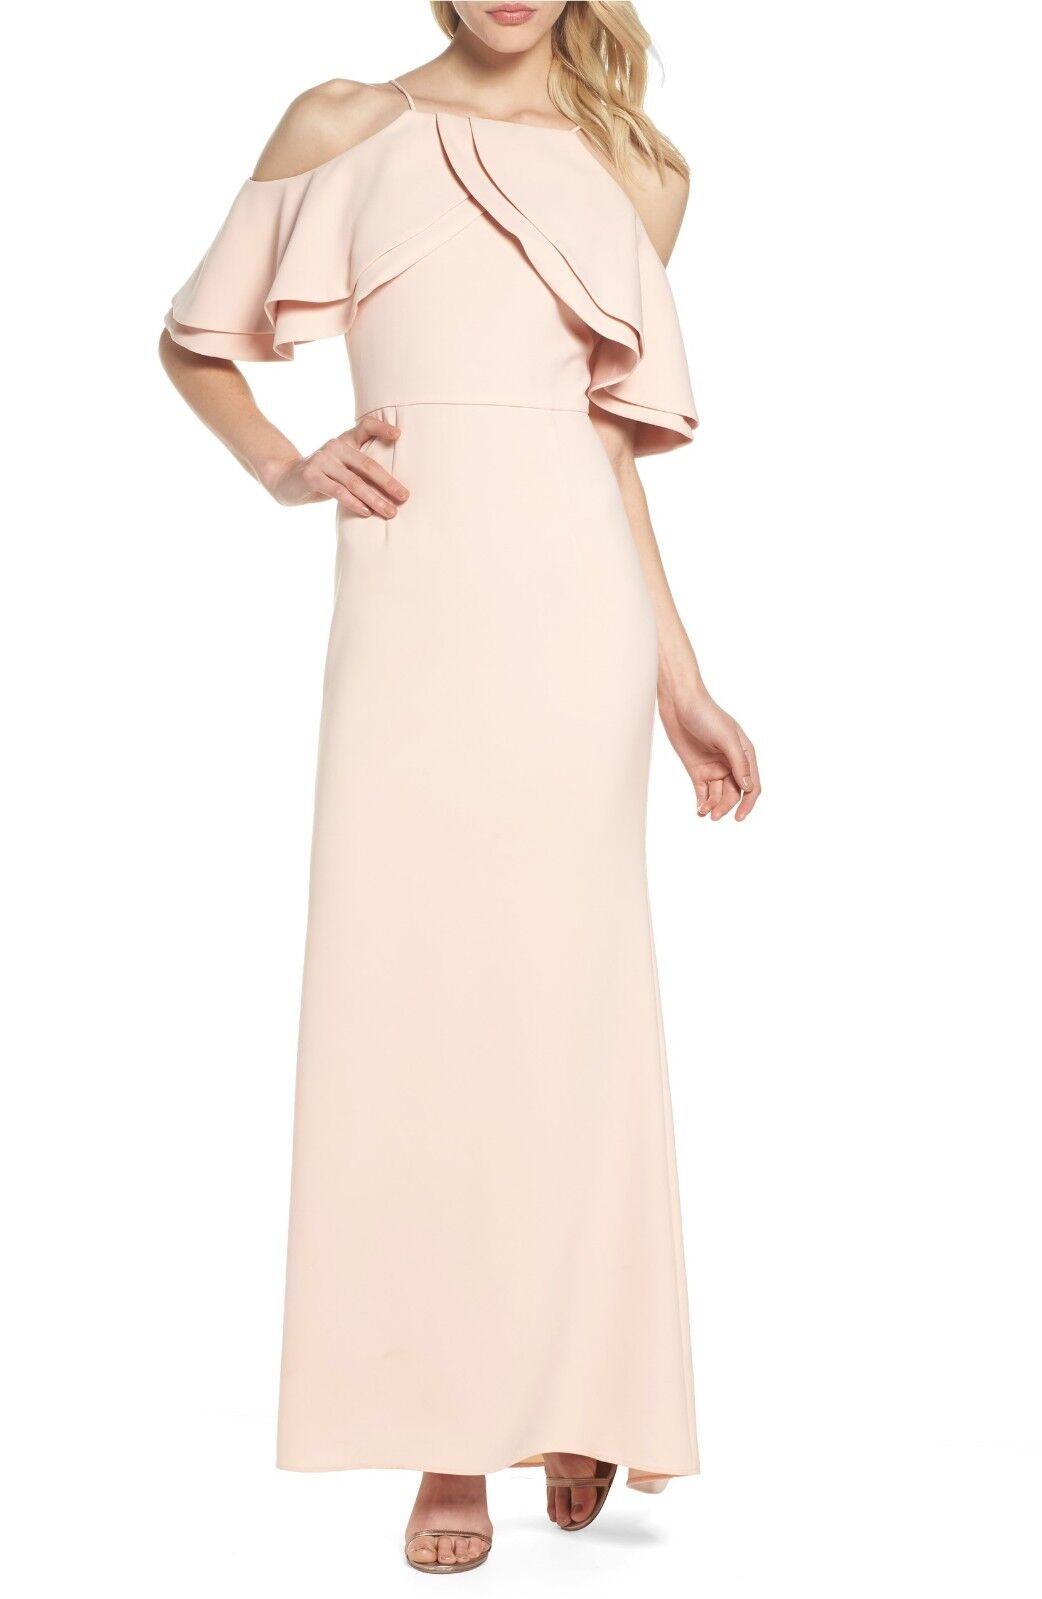 Eliza J Ruffle Bodice Cold Shoulder Gown, Größe 10P, Blaush, Retail ,  FL0527